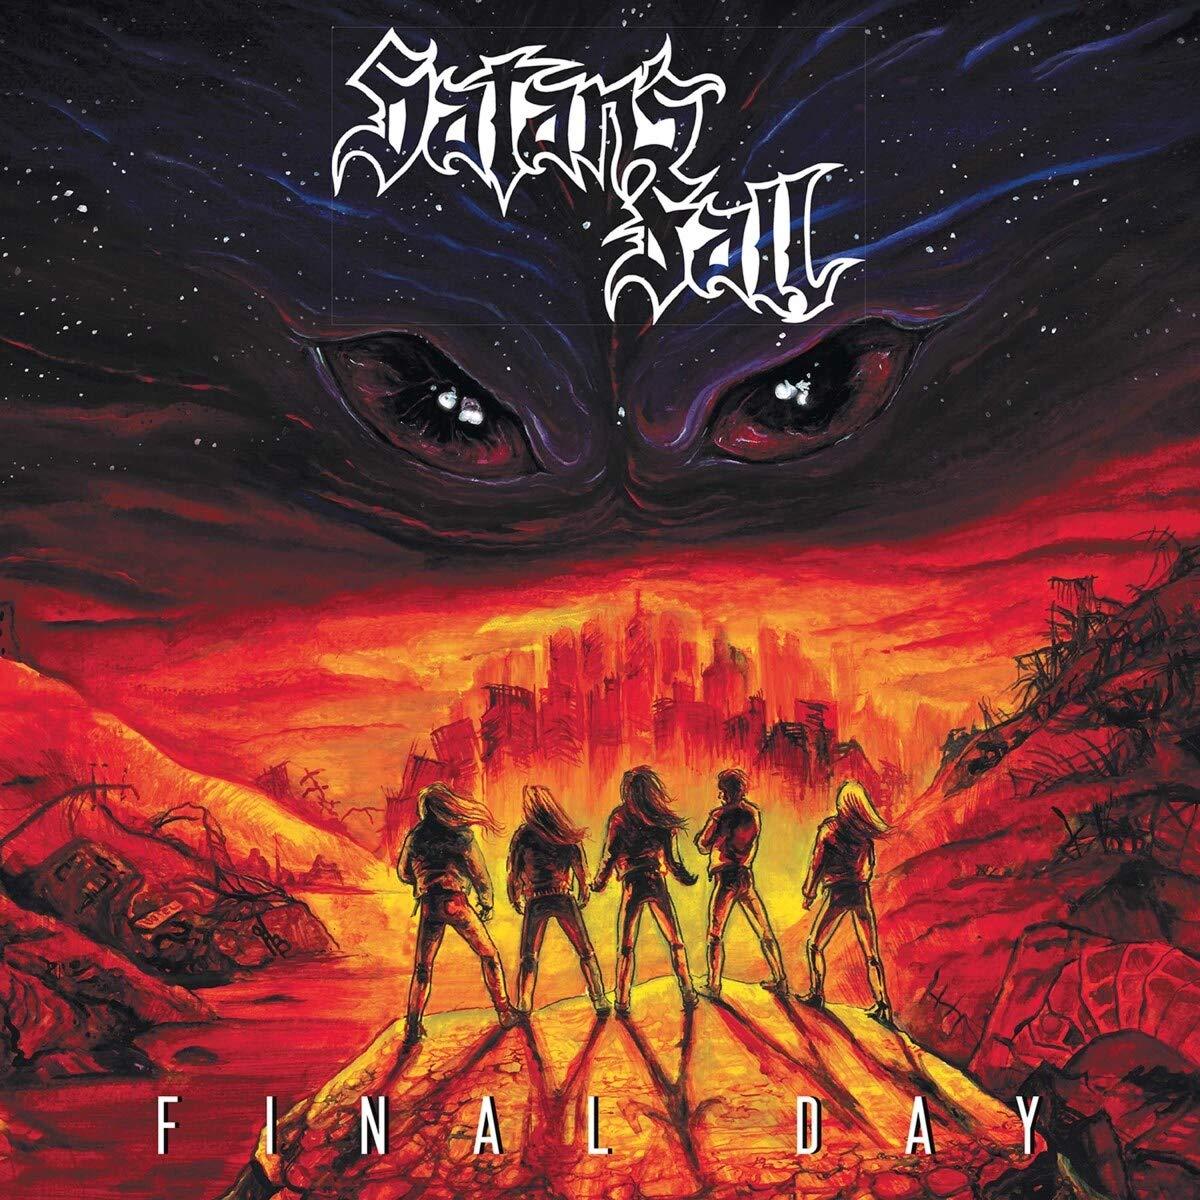 Satan's Fall - Final Day (2020) [FLAC] Download